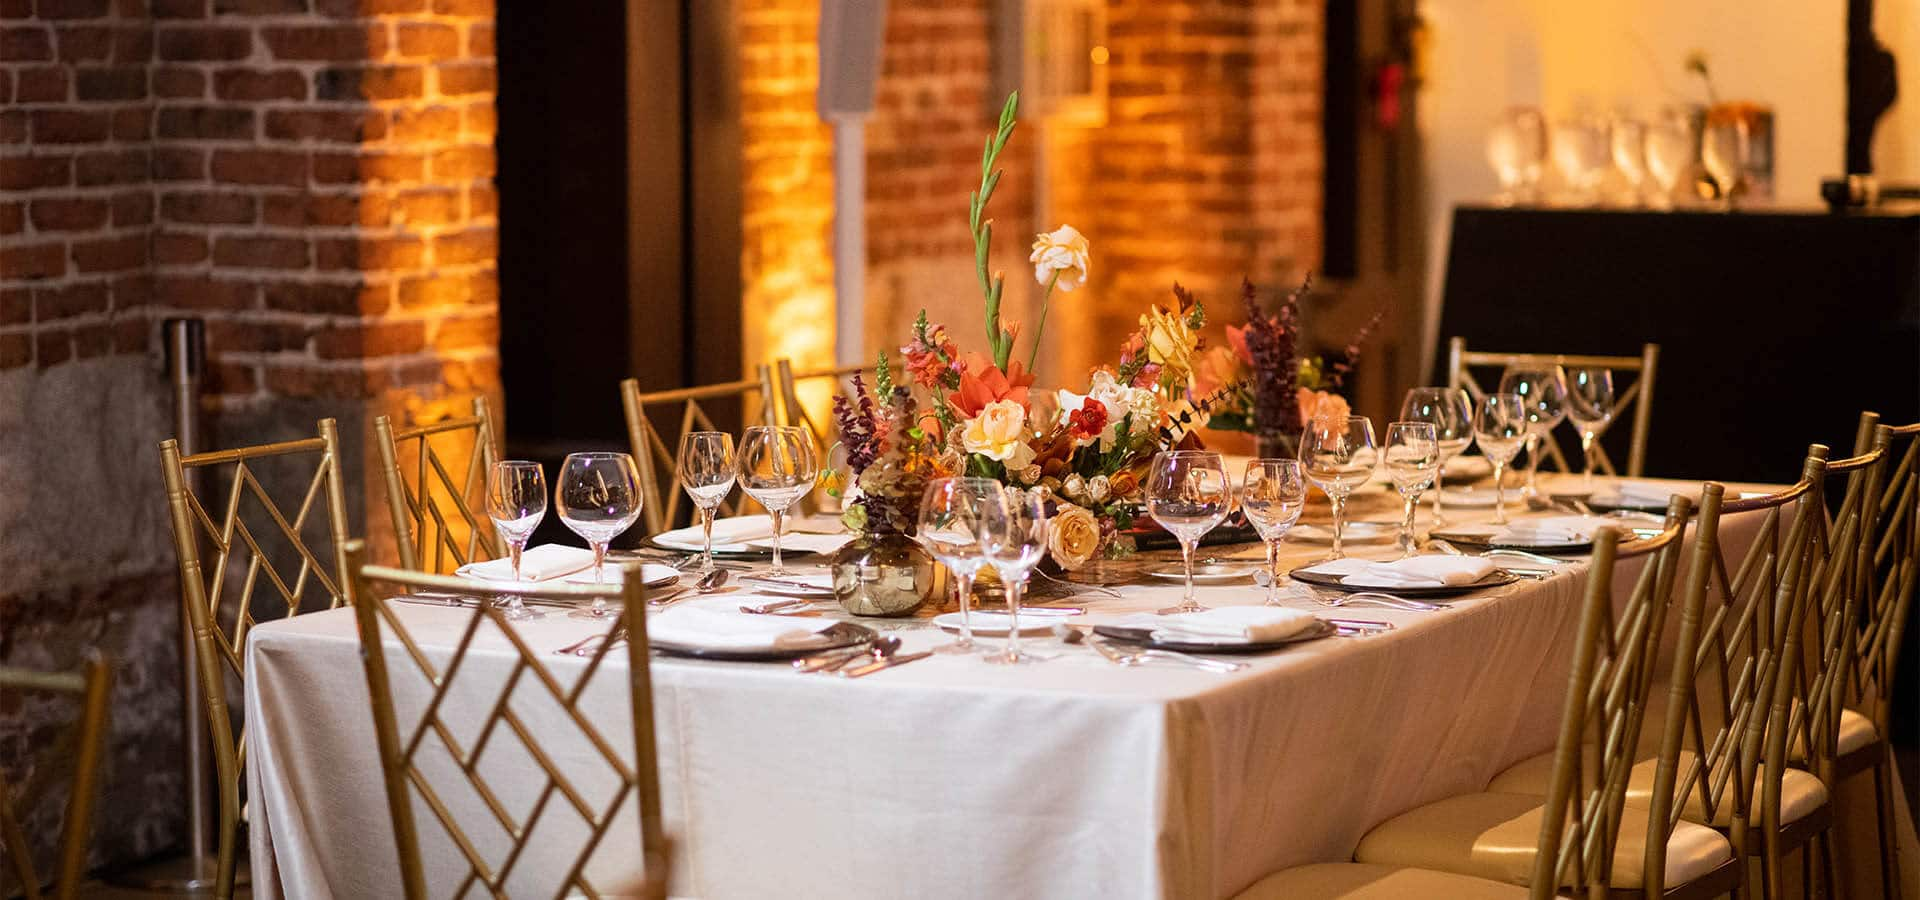 stuart rentals party table setting